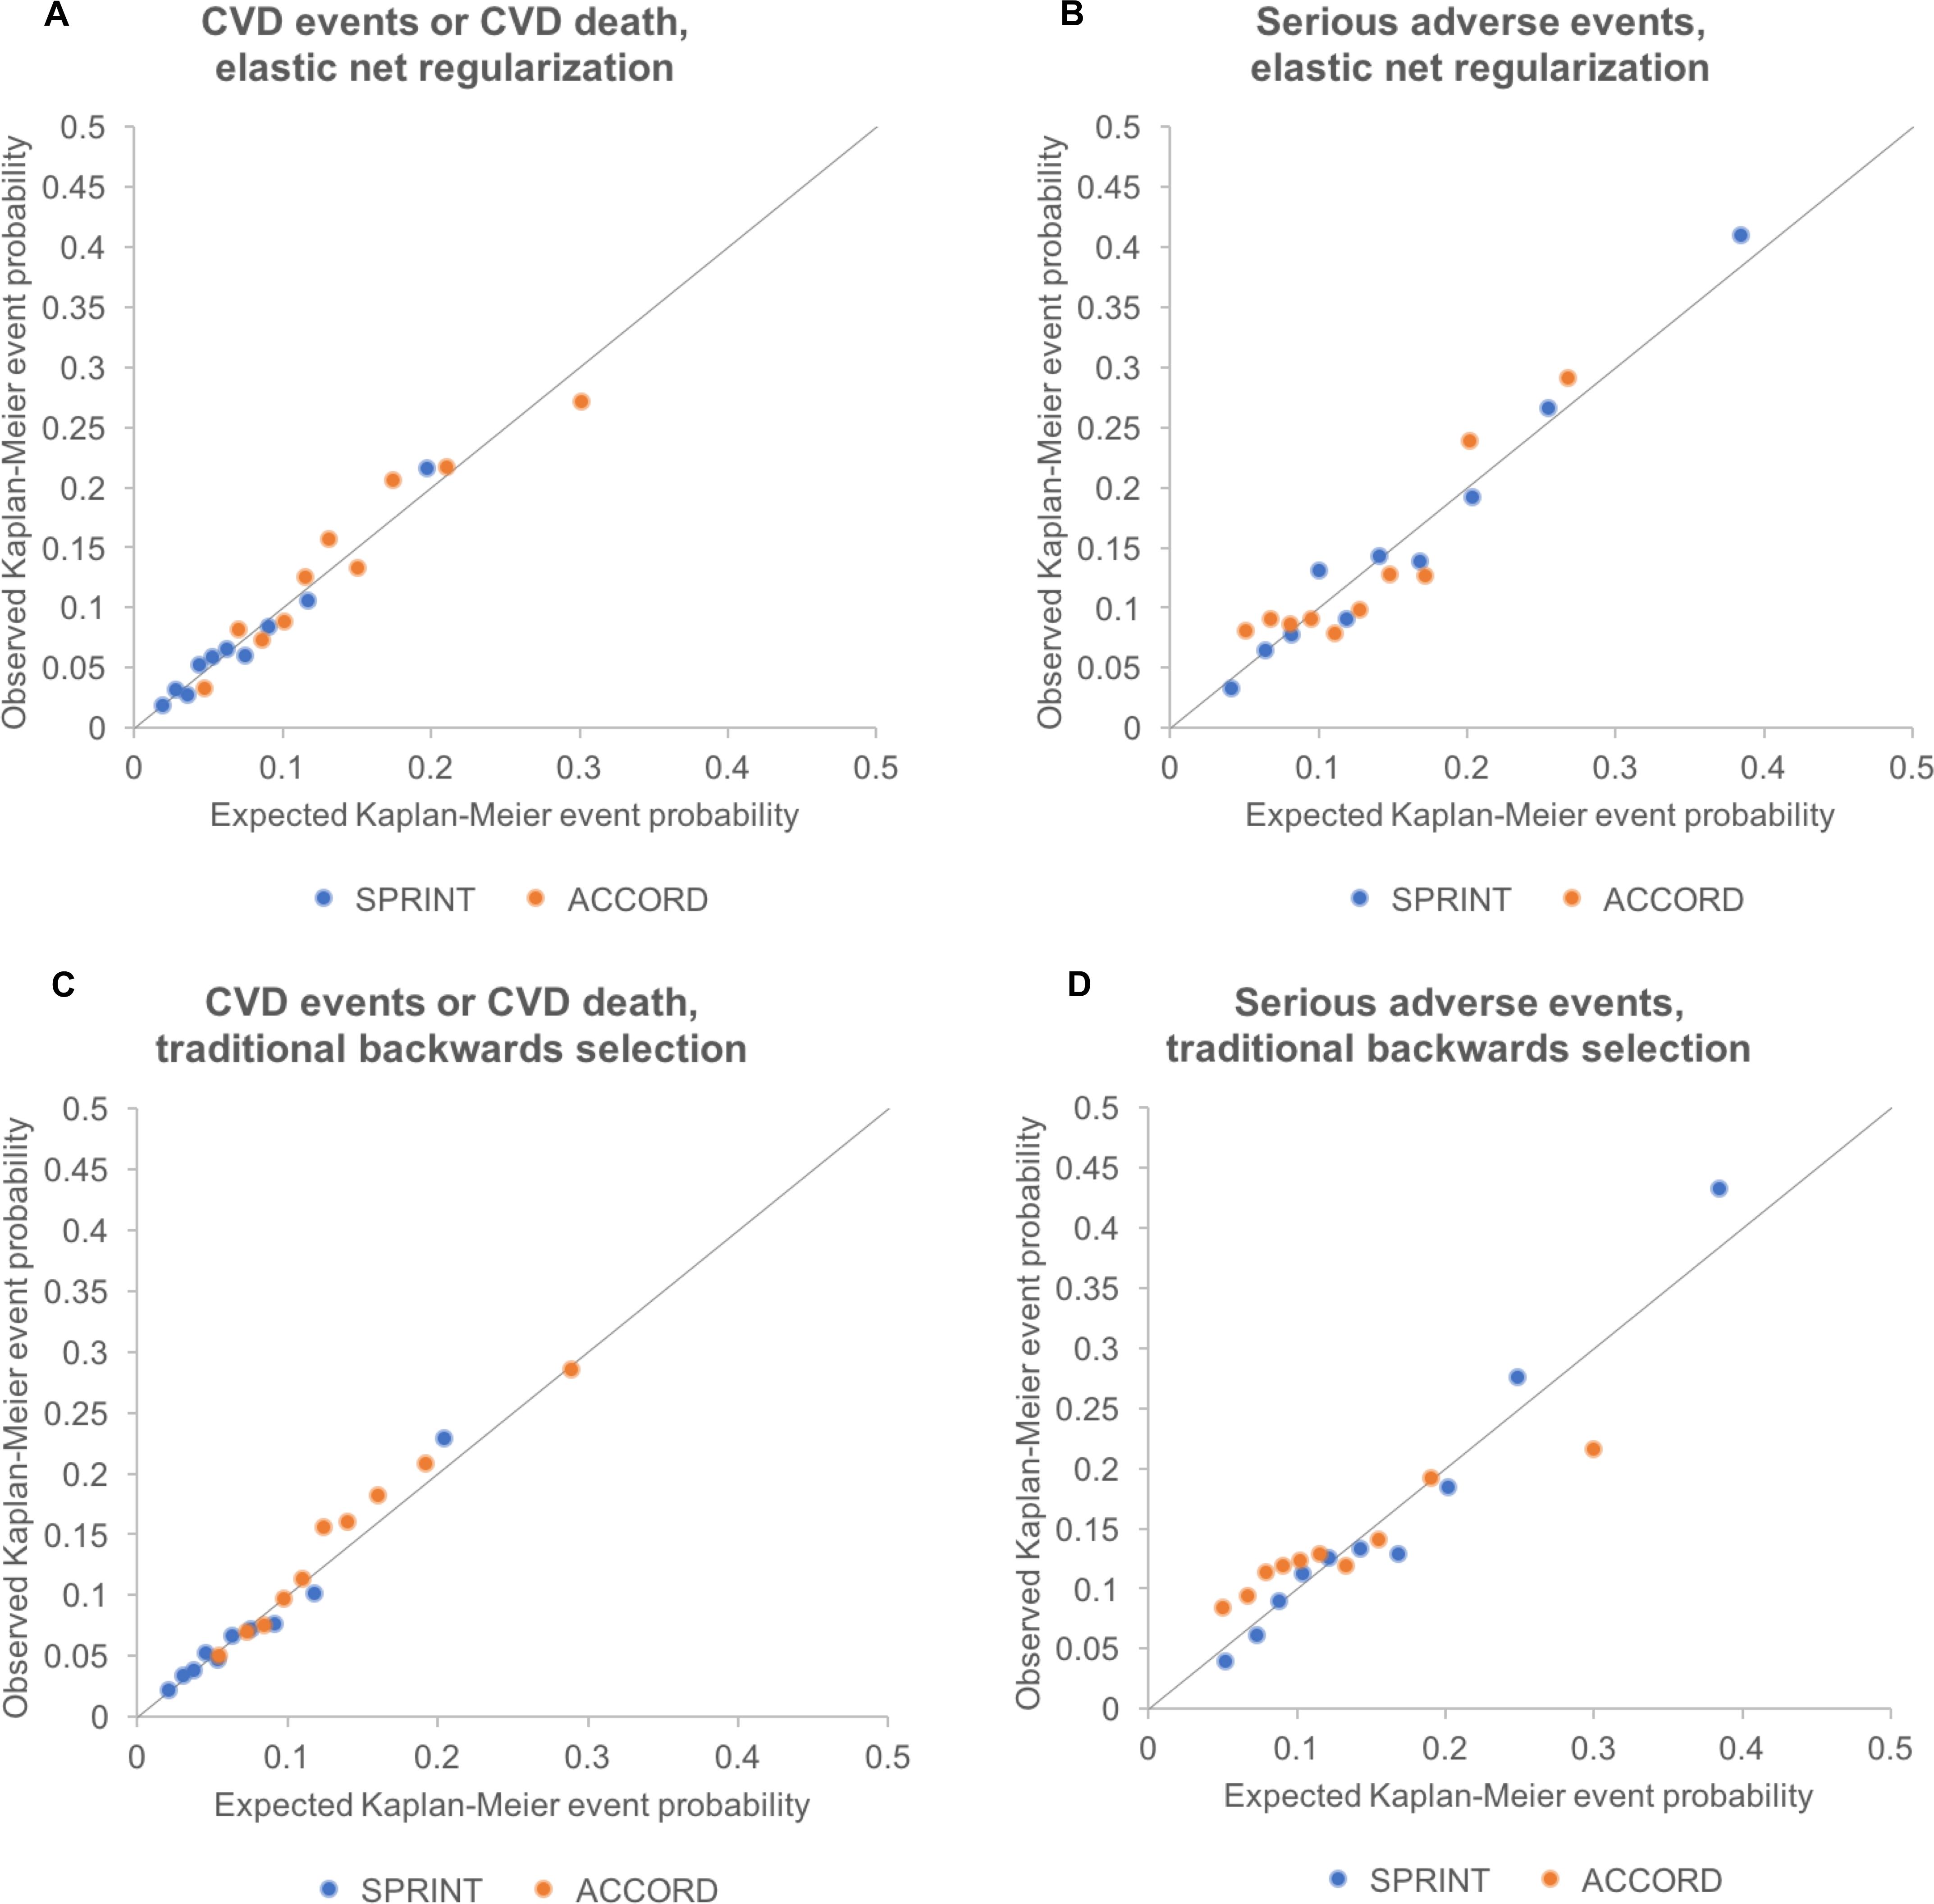 Calibration plots for models fit by elastic net regularization versus traditional backwards selection.